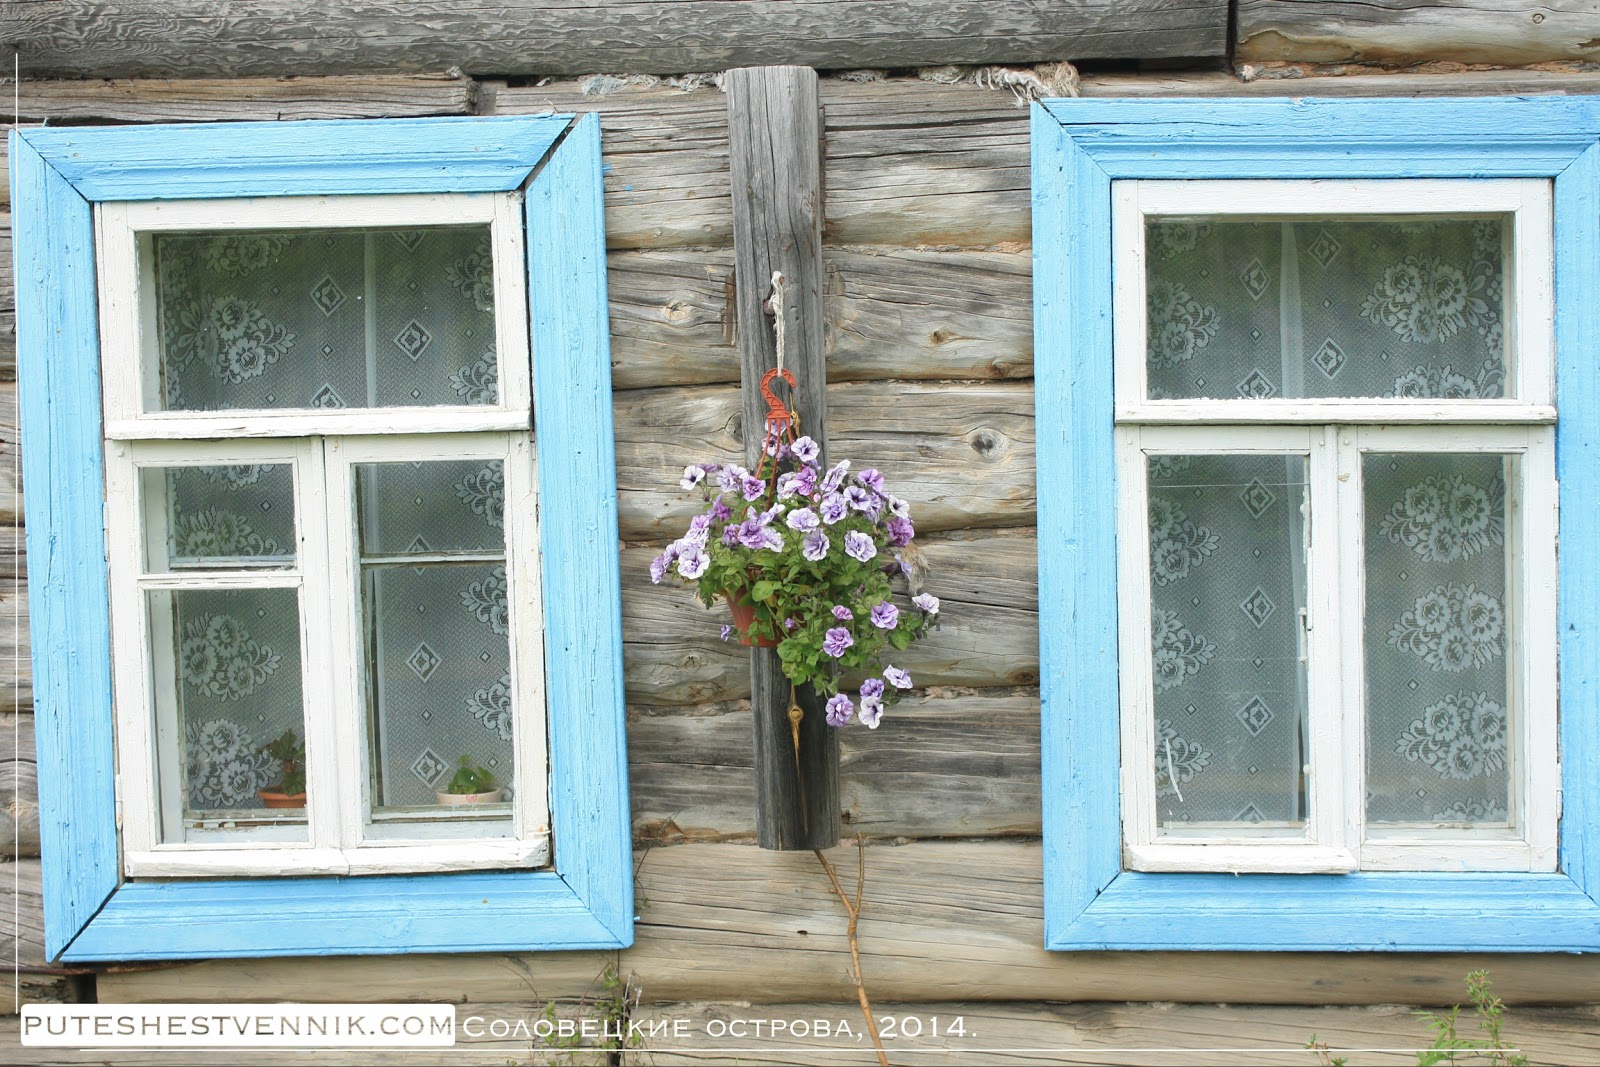 Окна деревянного дома на Соловках